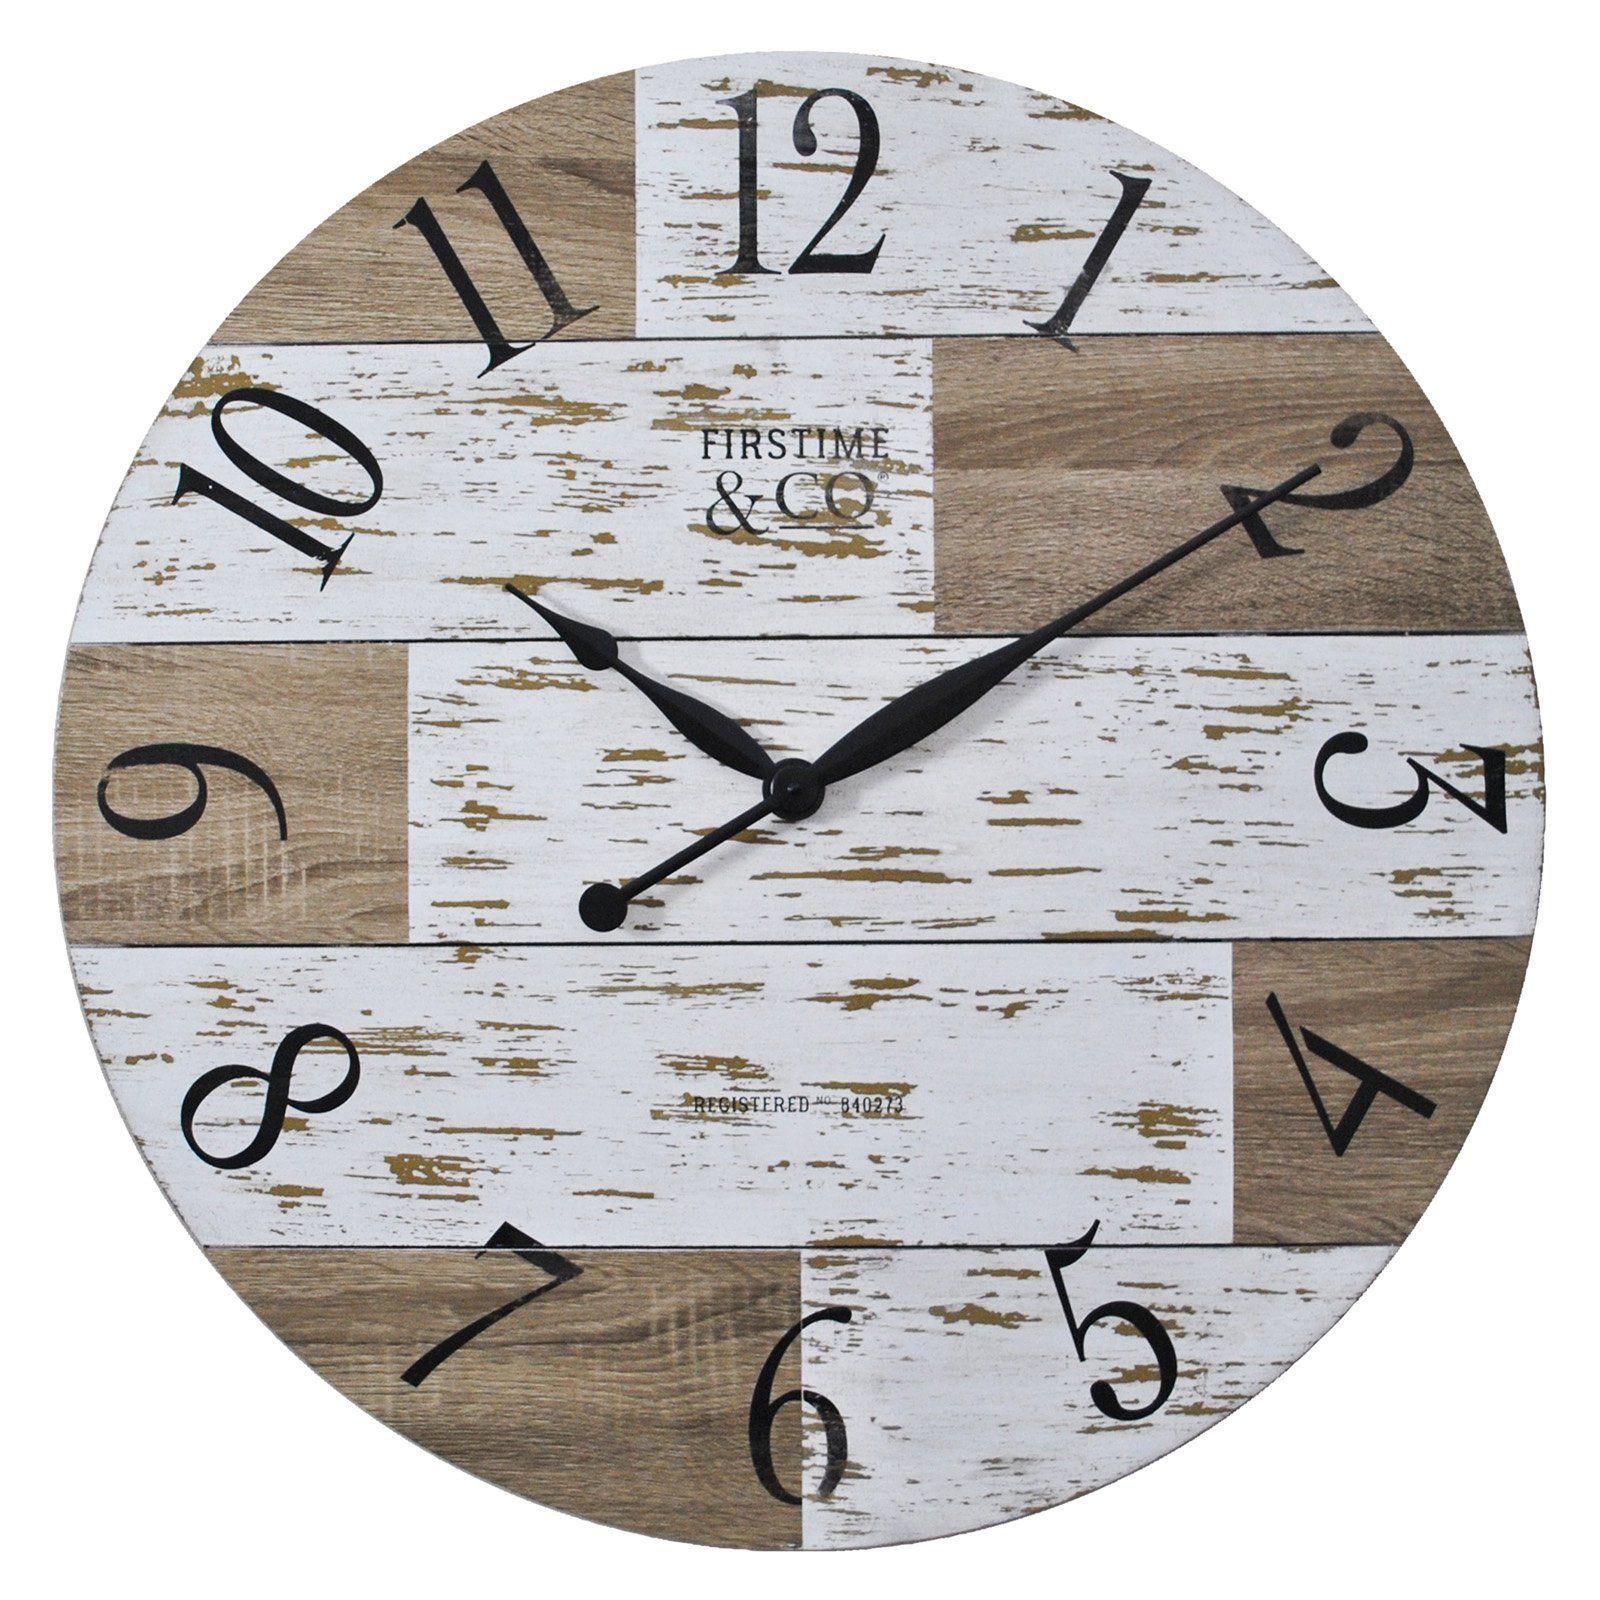 Firstime 27 In Harper Pallets Wall Clock Pallet Walls Wall